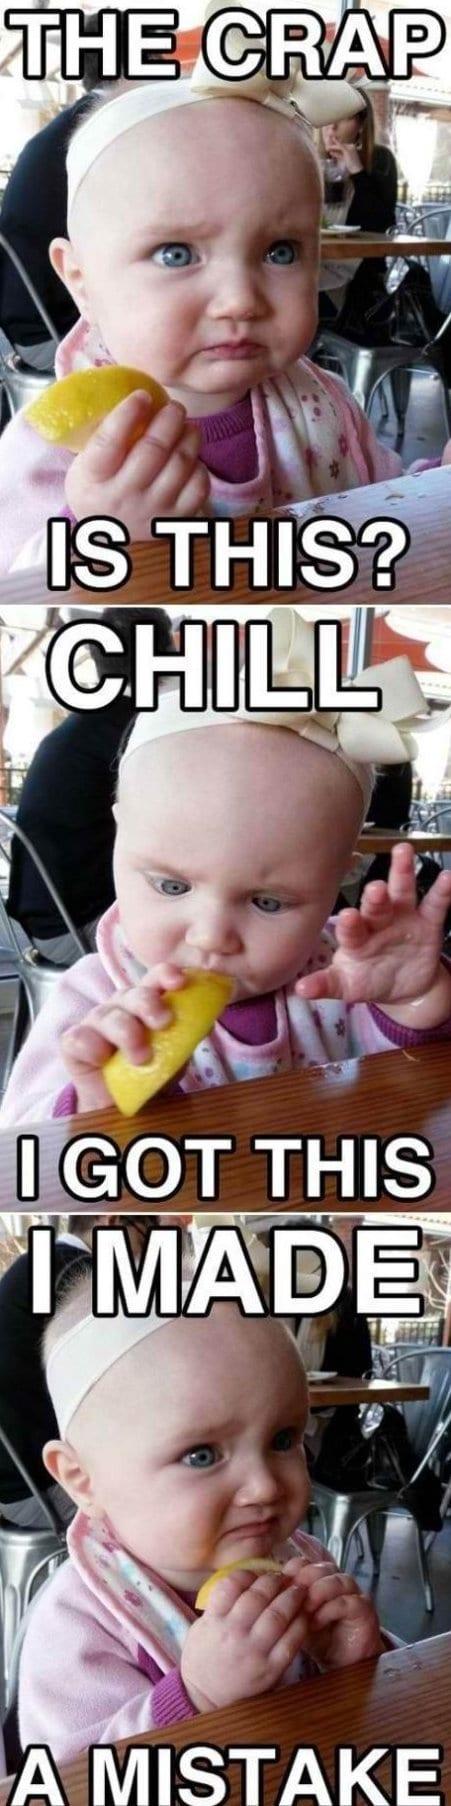 funny-images-just-a-lemon